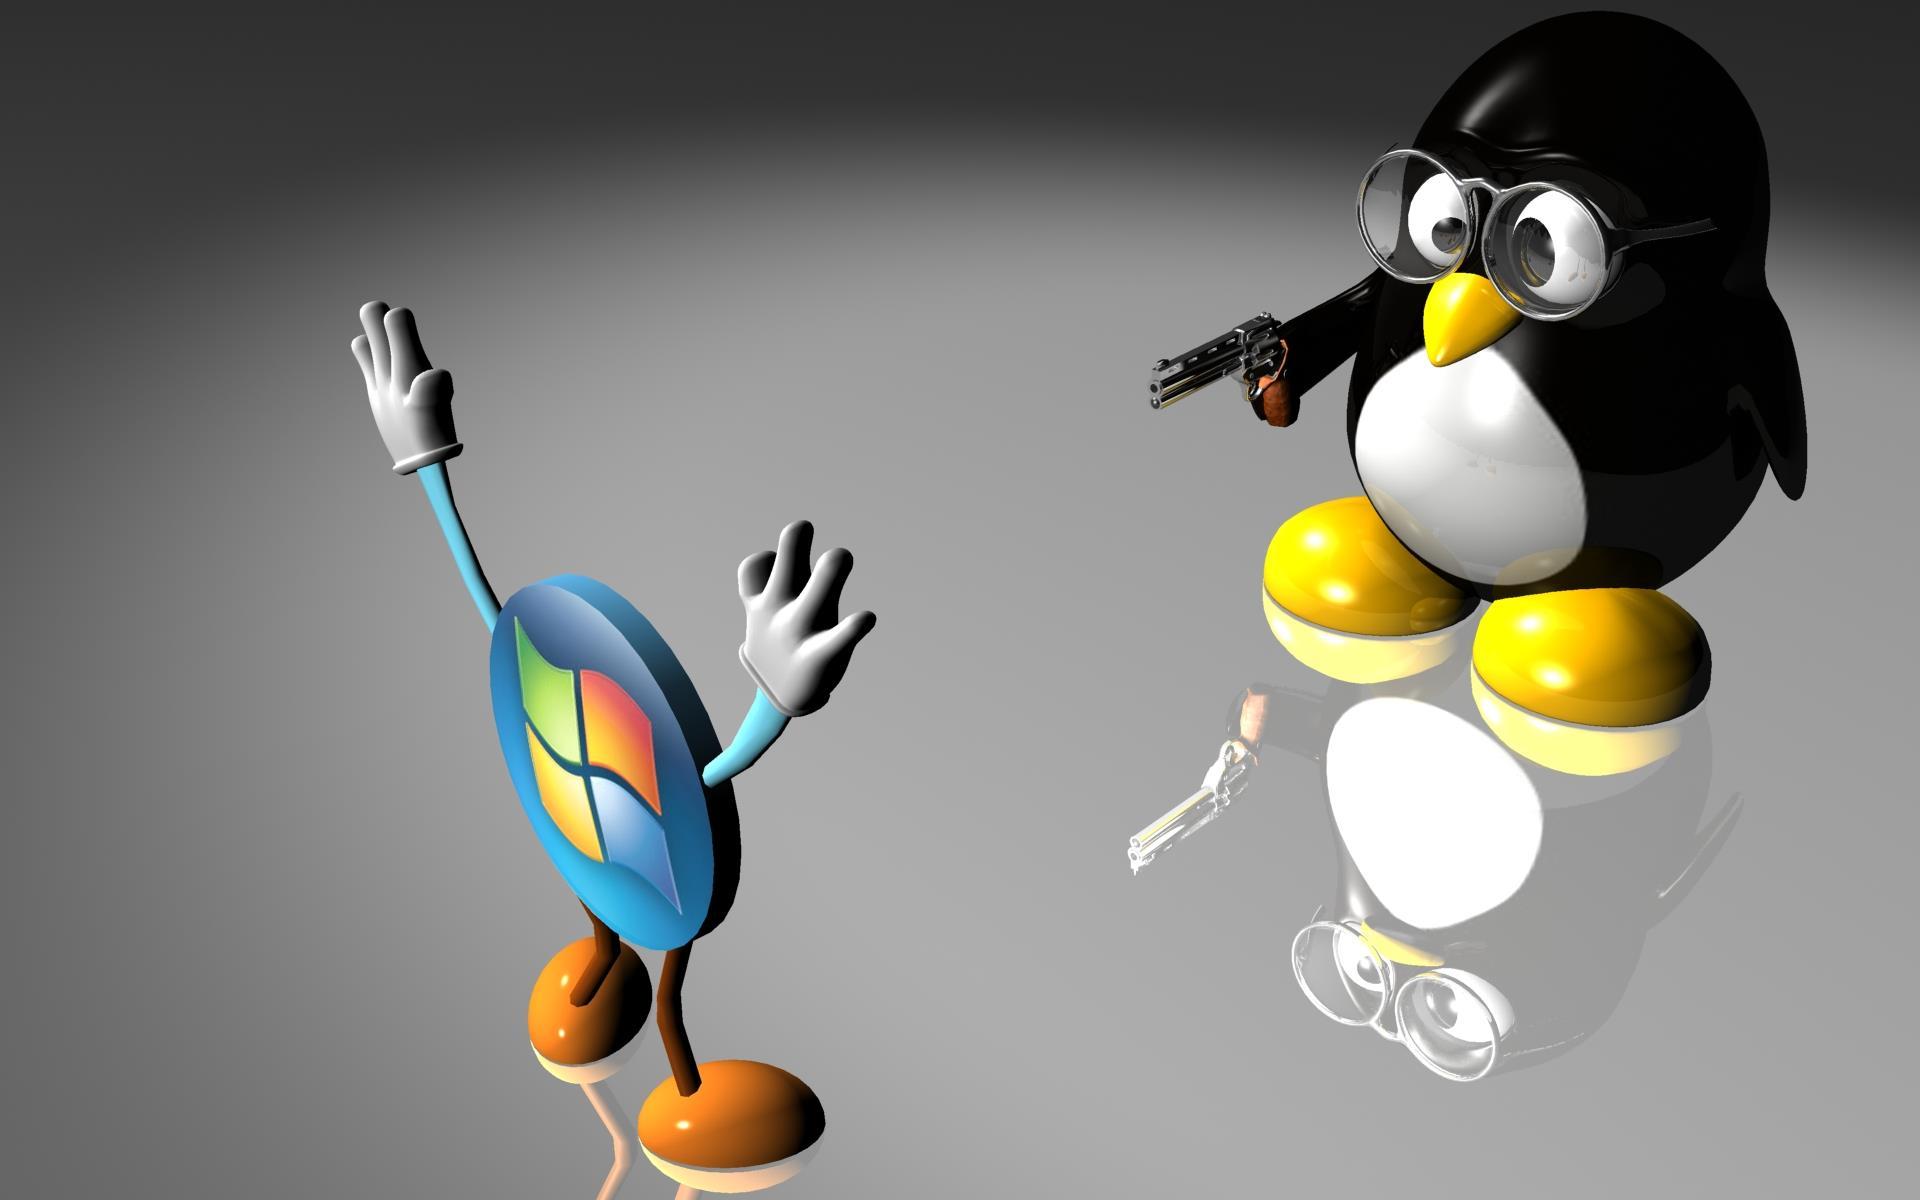 linux-ubuntu-wallpaper-OS-free-tux-le-manchot_1